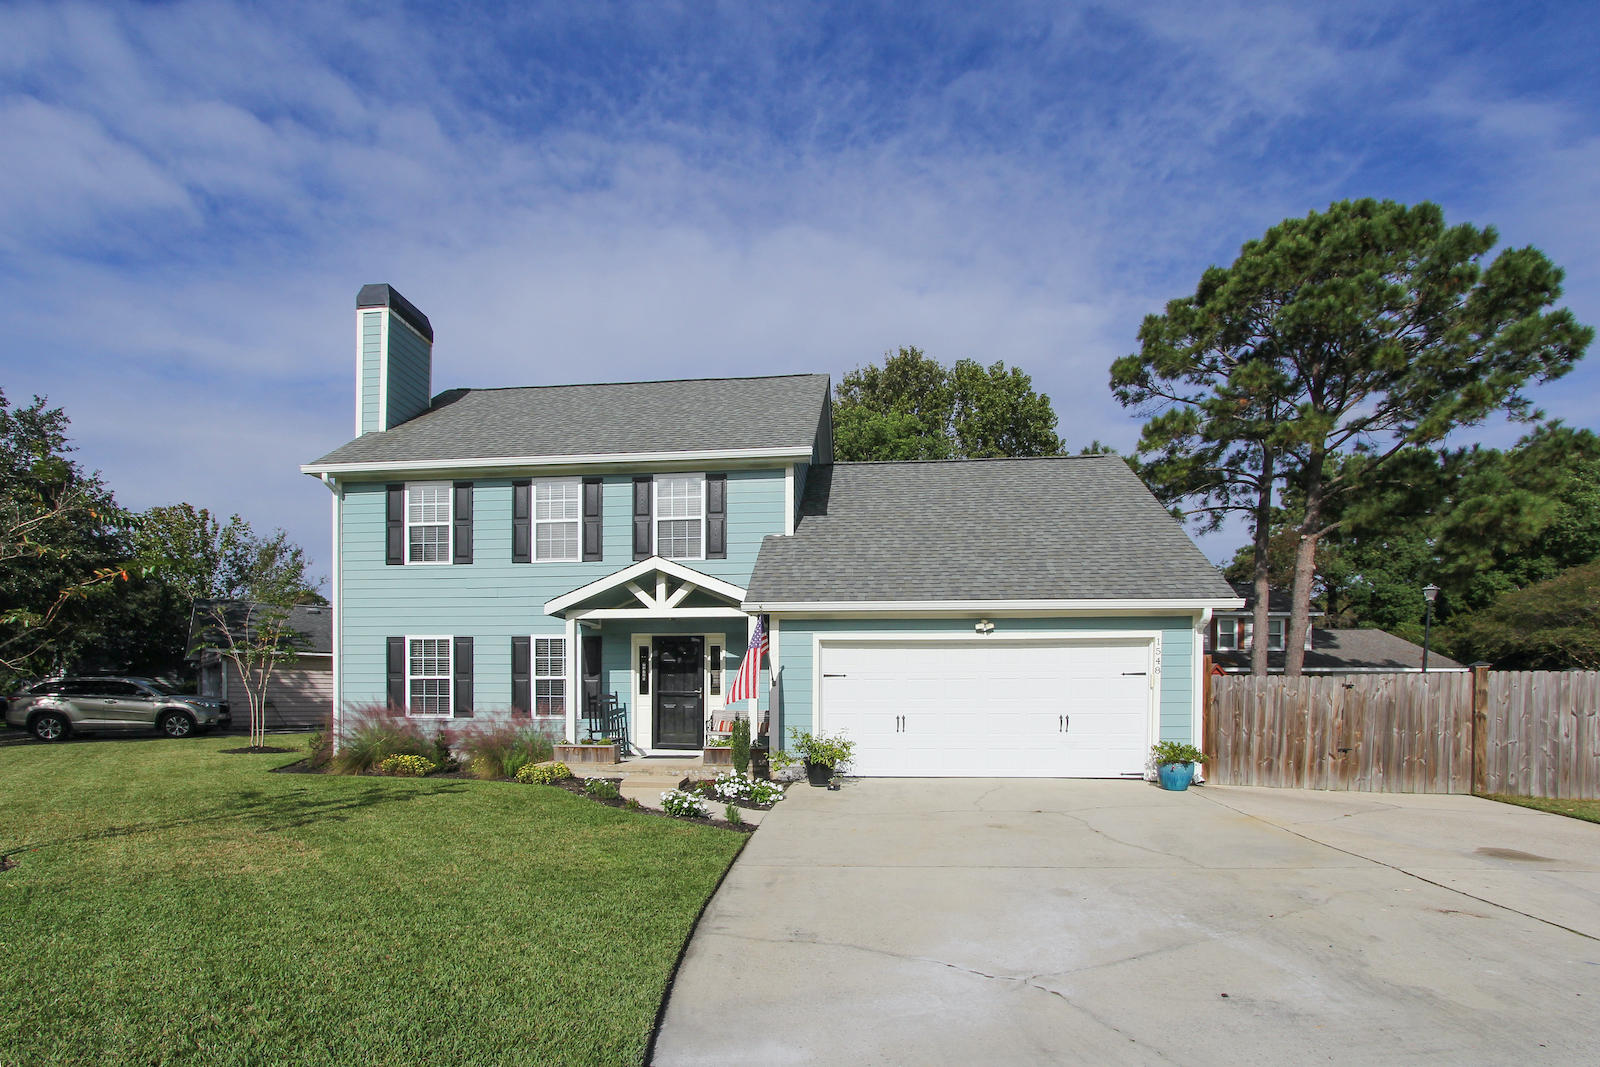 Landings Run Homes For Sale - 1548 Wickfield, Mount Pleasant, SC - 8